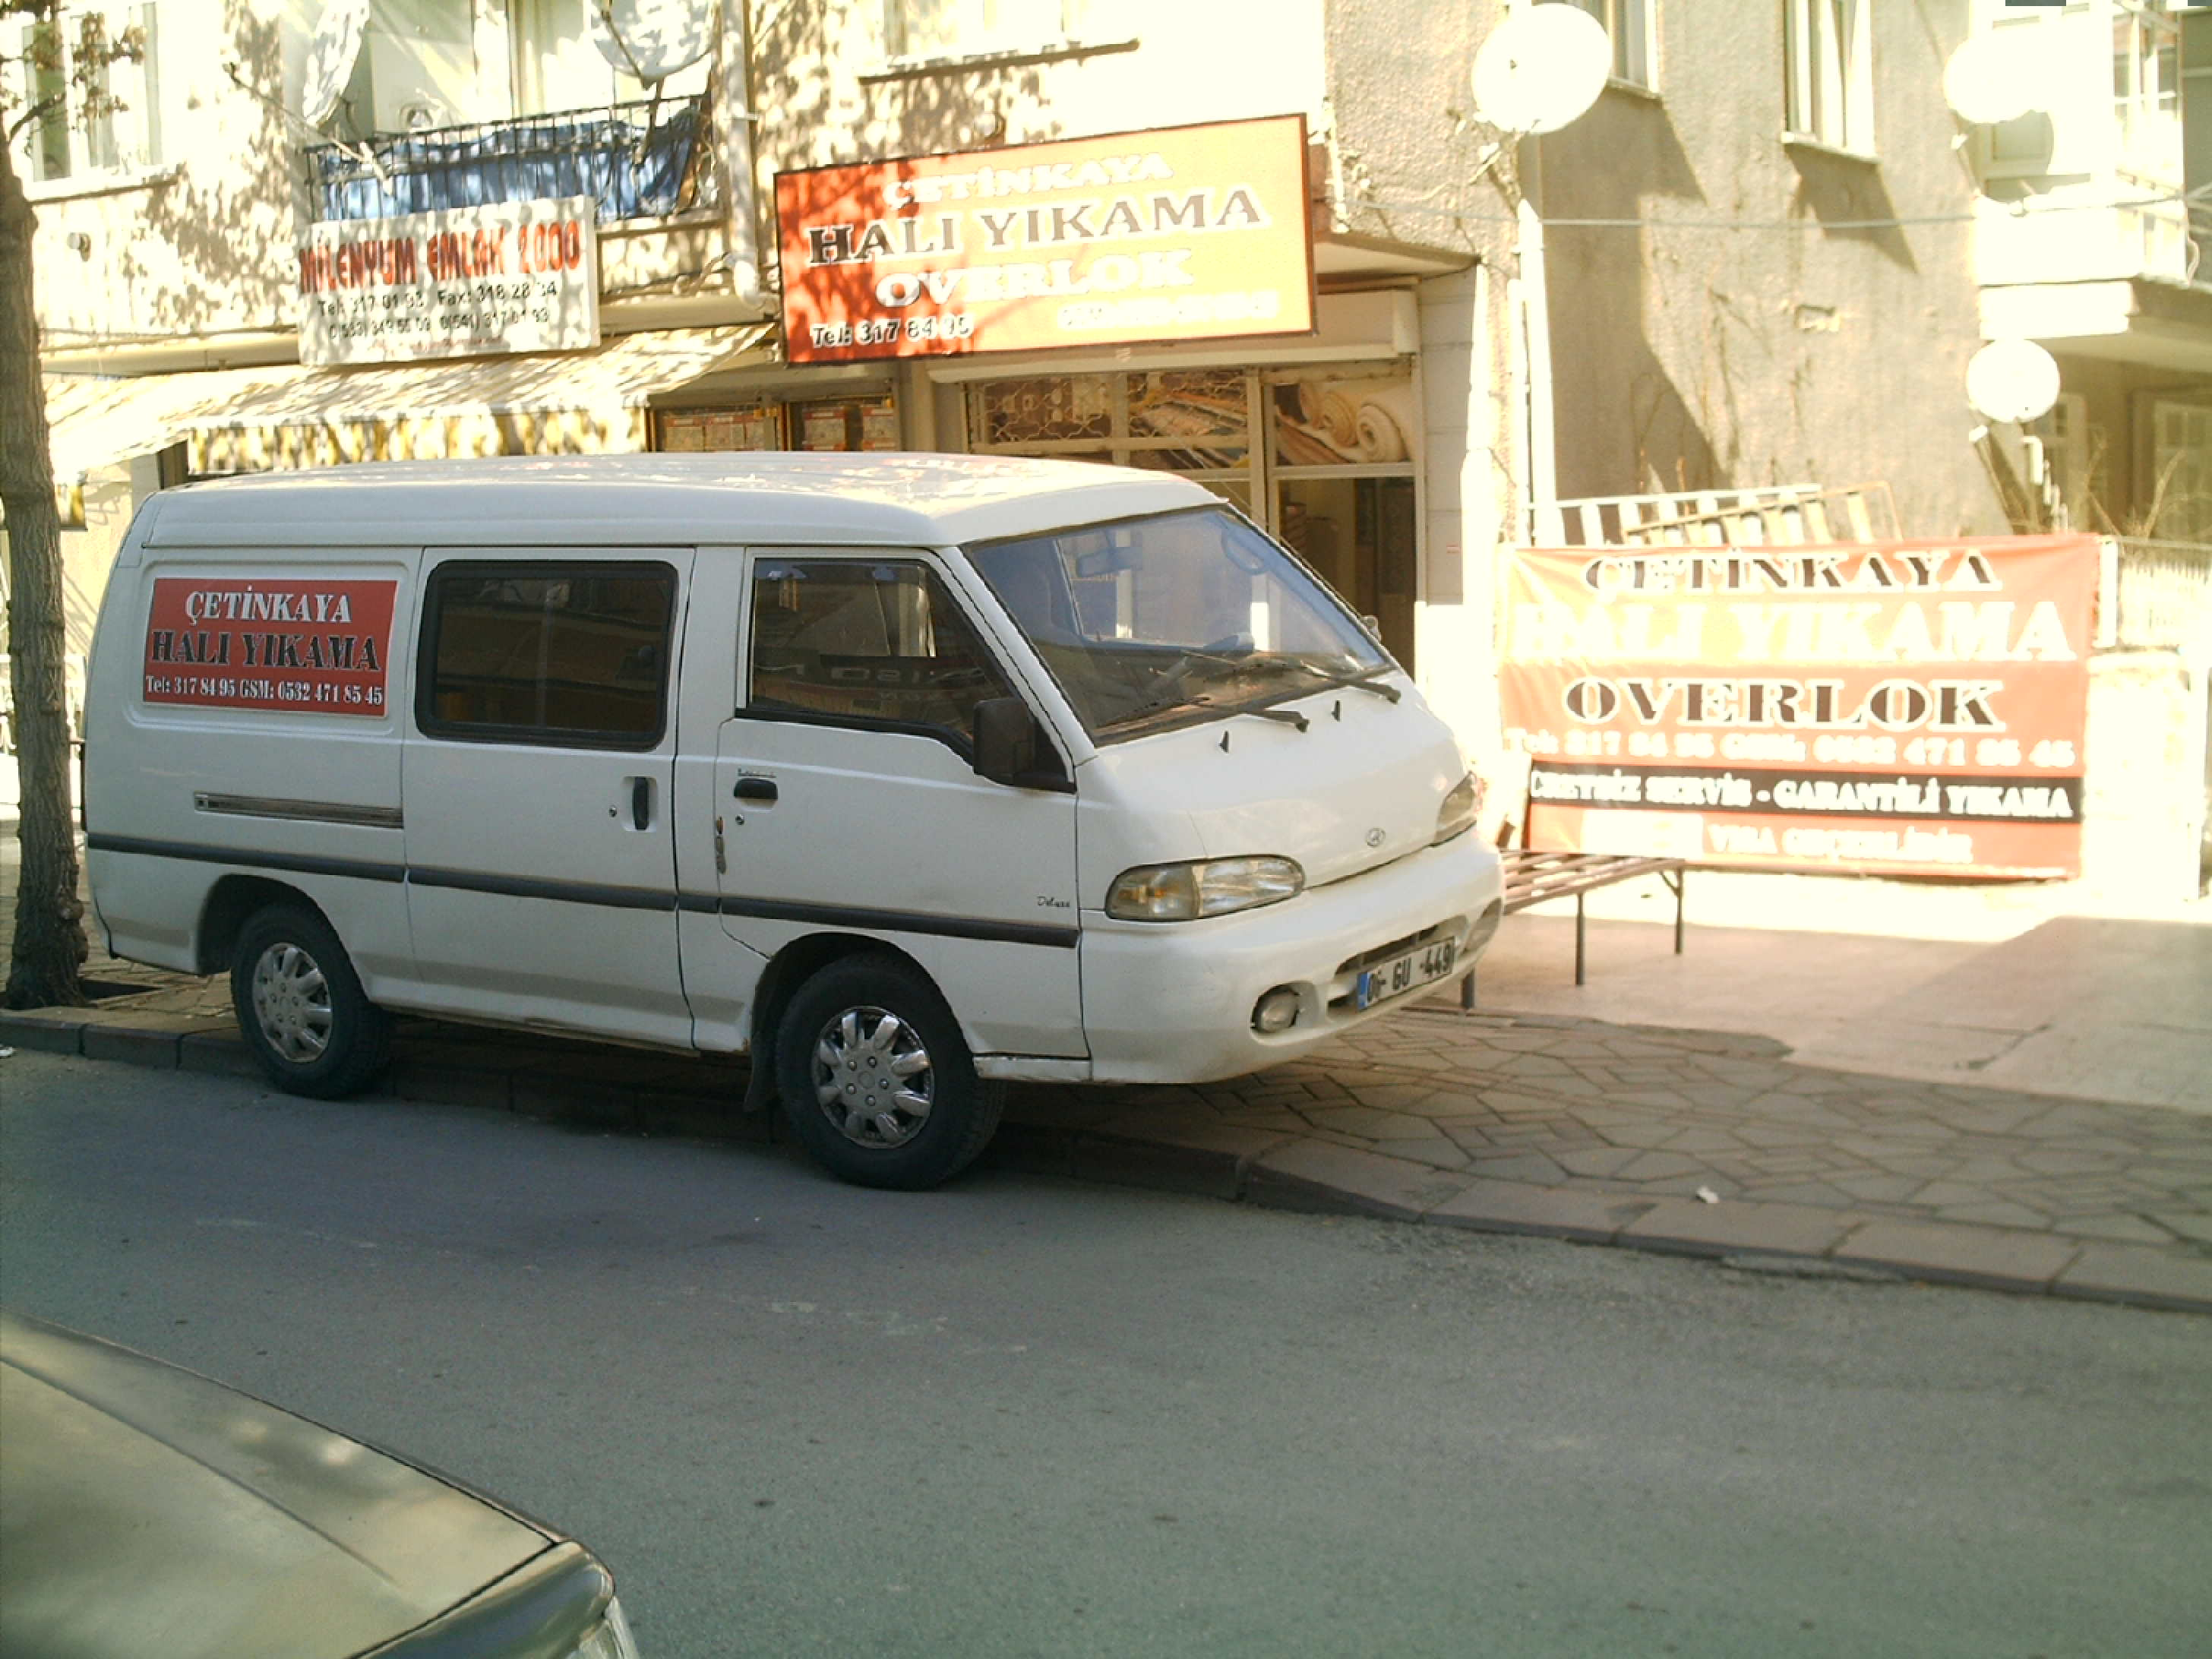 altinpark_hali_yikama_servis